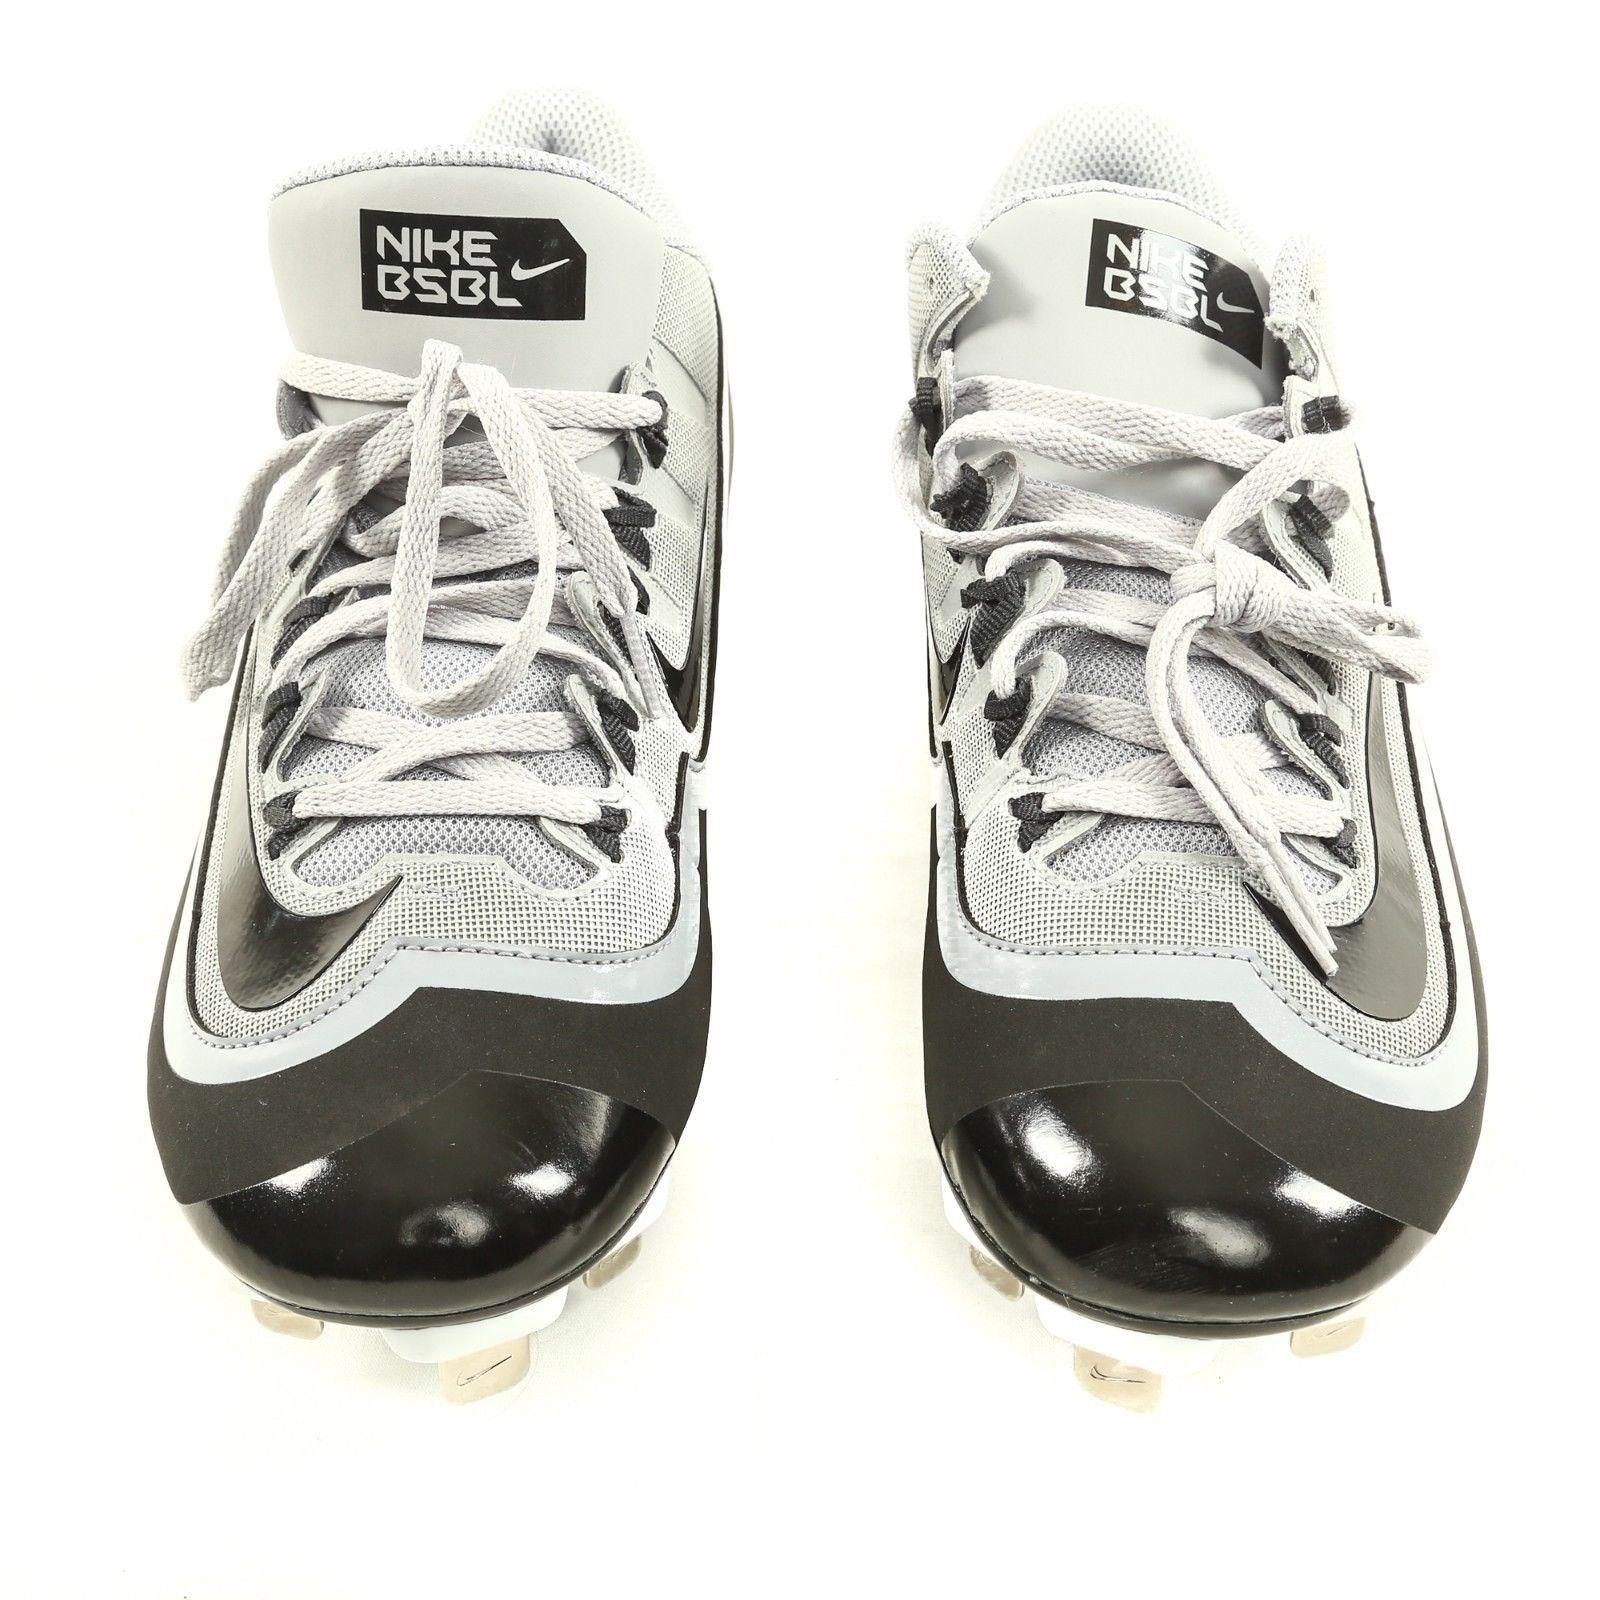 817a0cdbf91f ... Nike Air Baseball Cleats Huarache 2K Filth Pro Low Metal 807126-001 Men  11.5 NEW ...